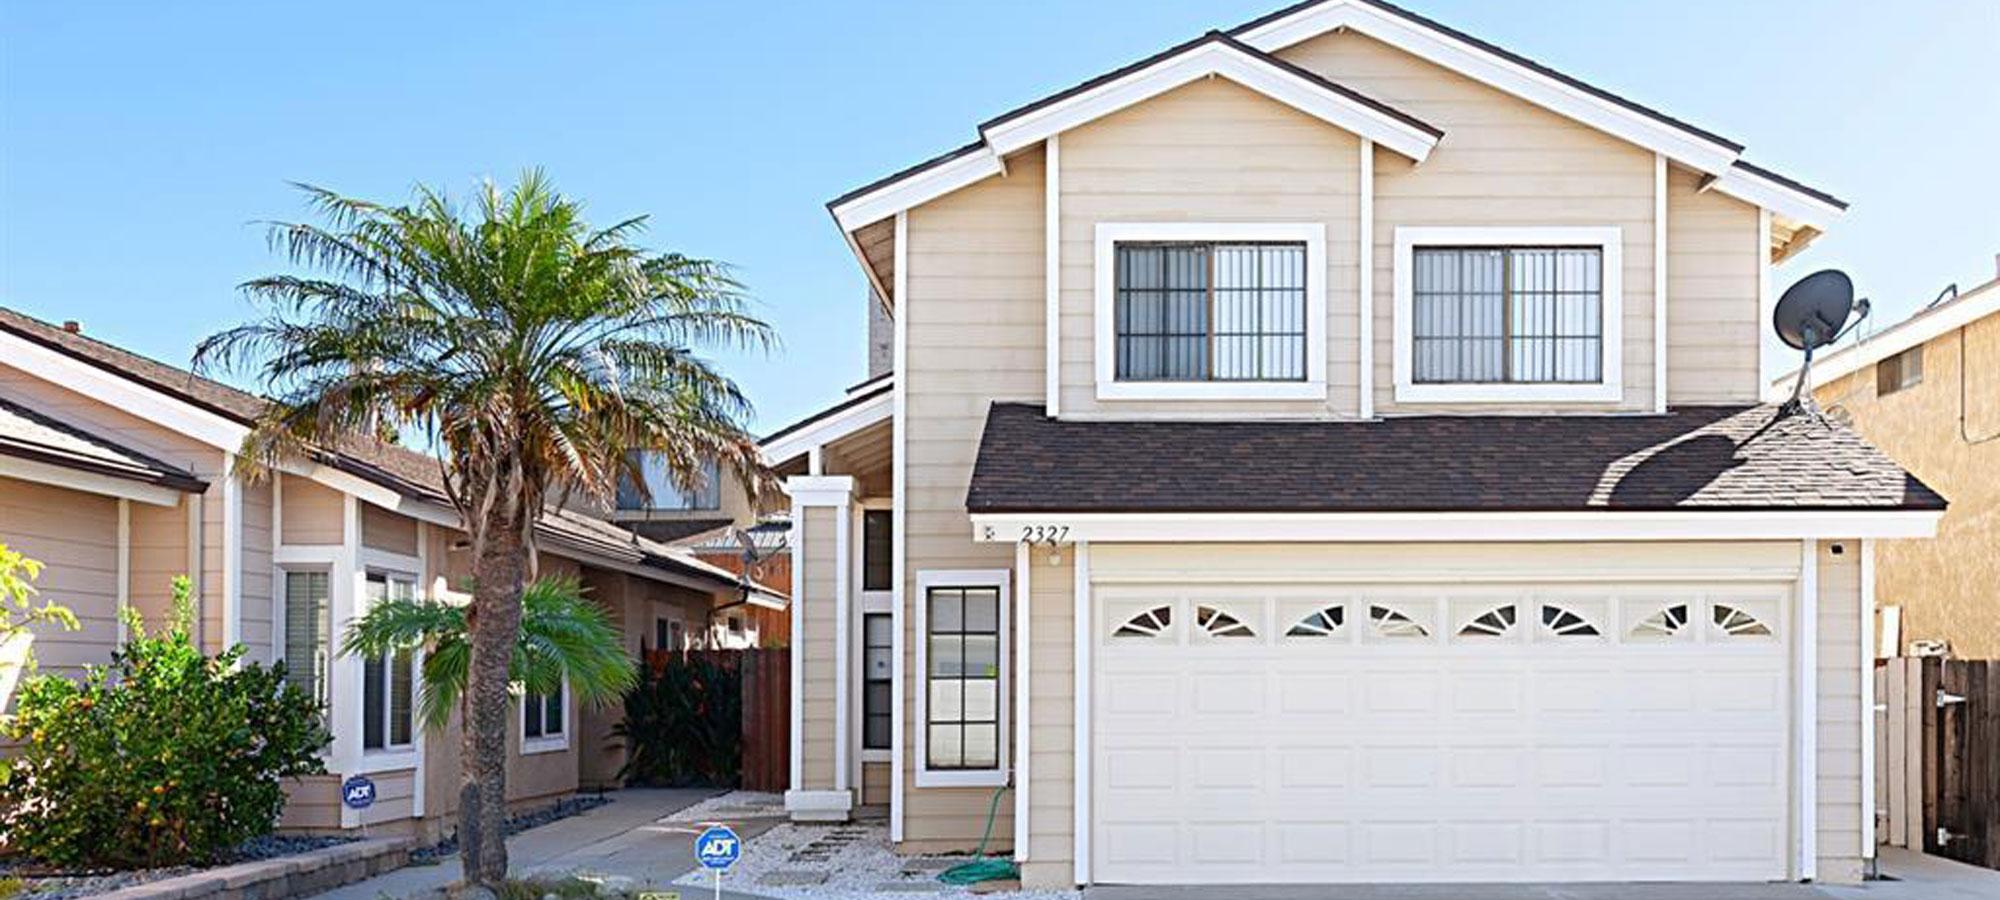 2327 Sherwood Dr. Lemon Grove, CA 91945